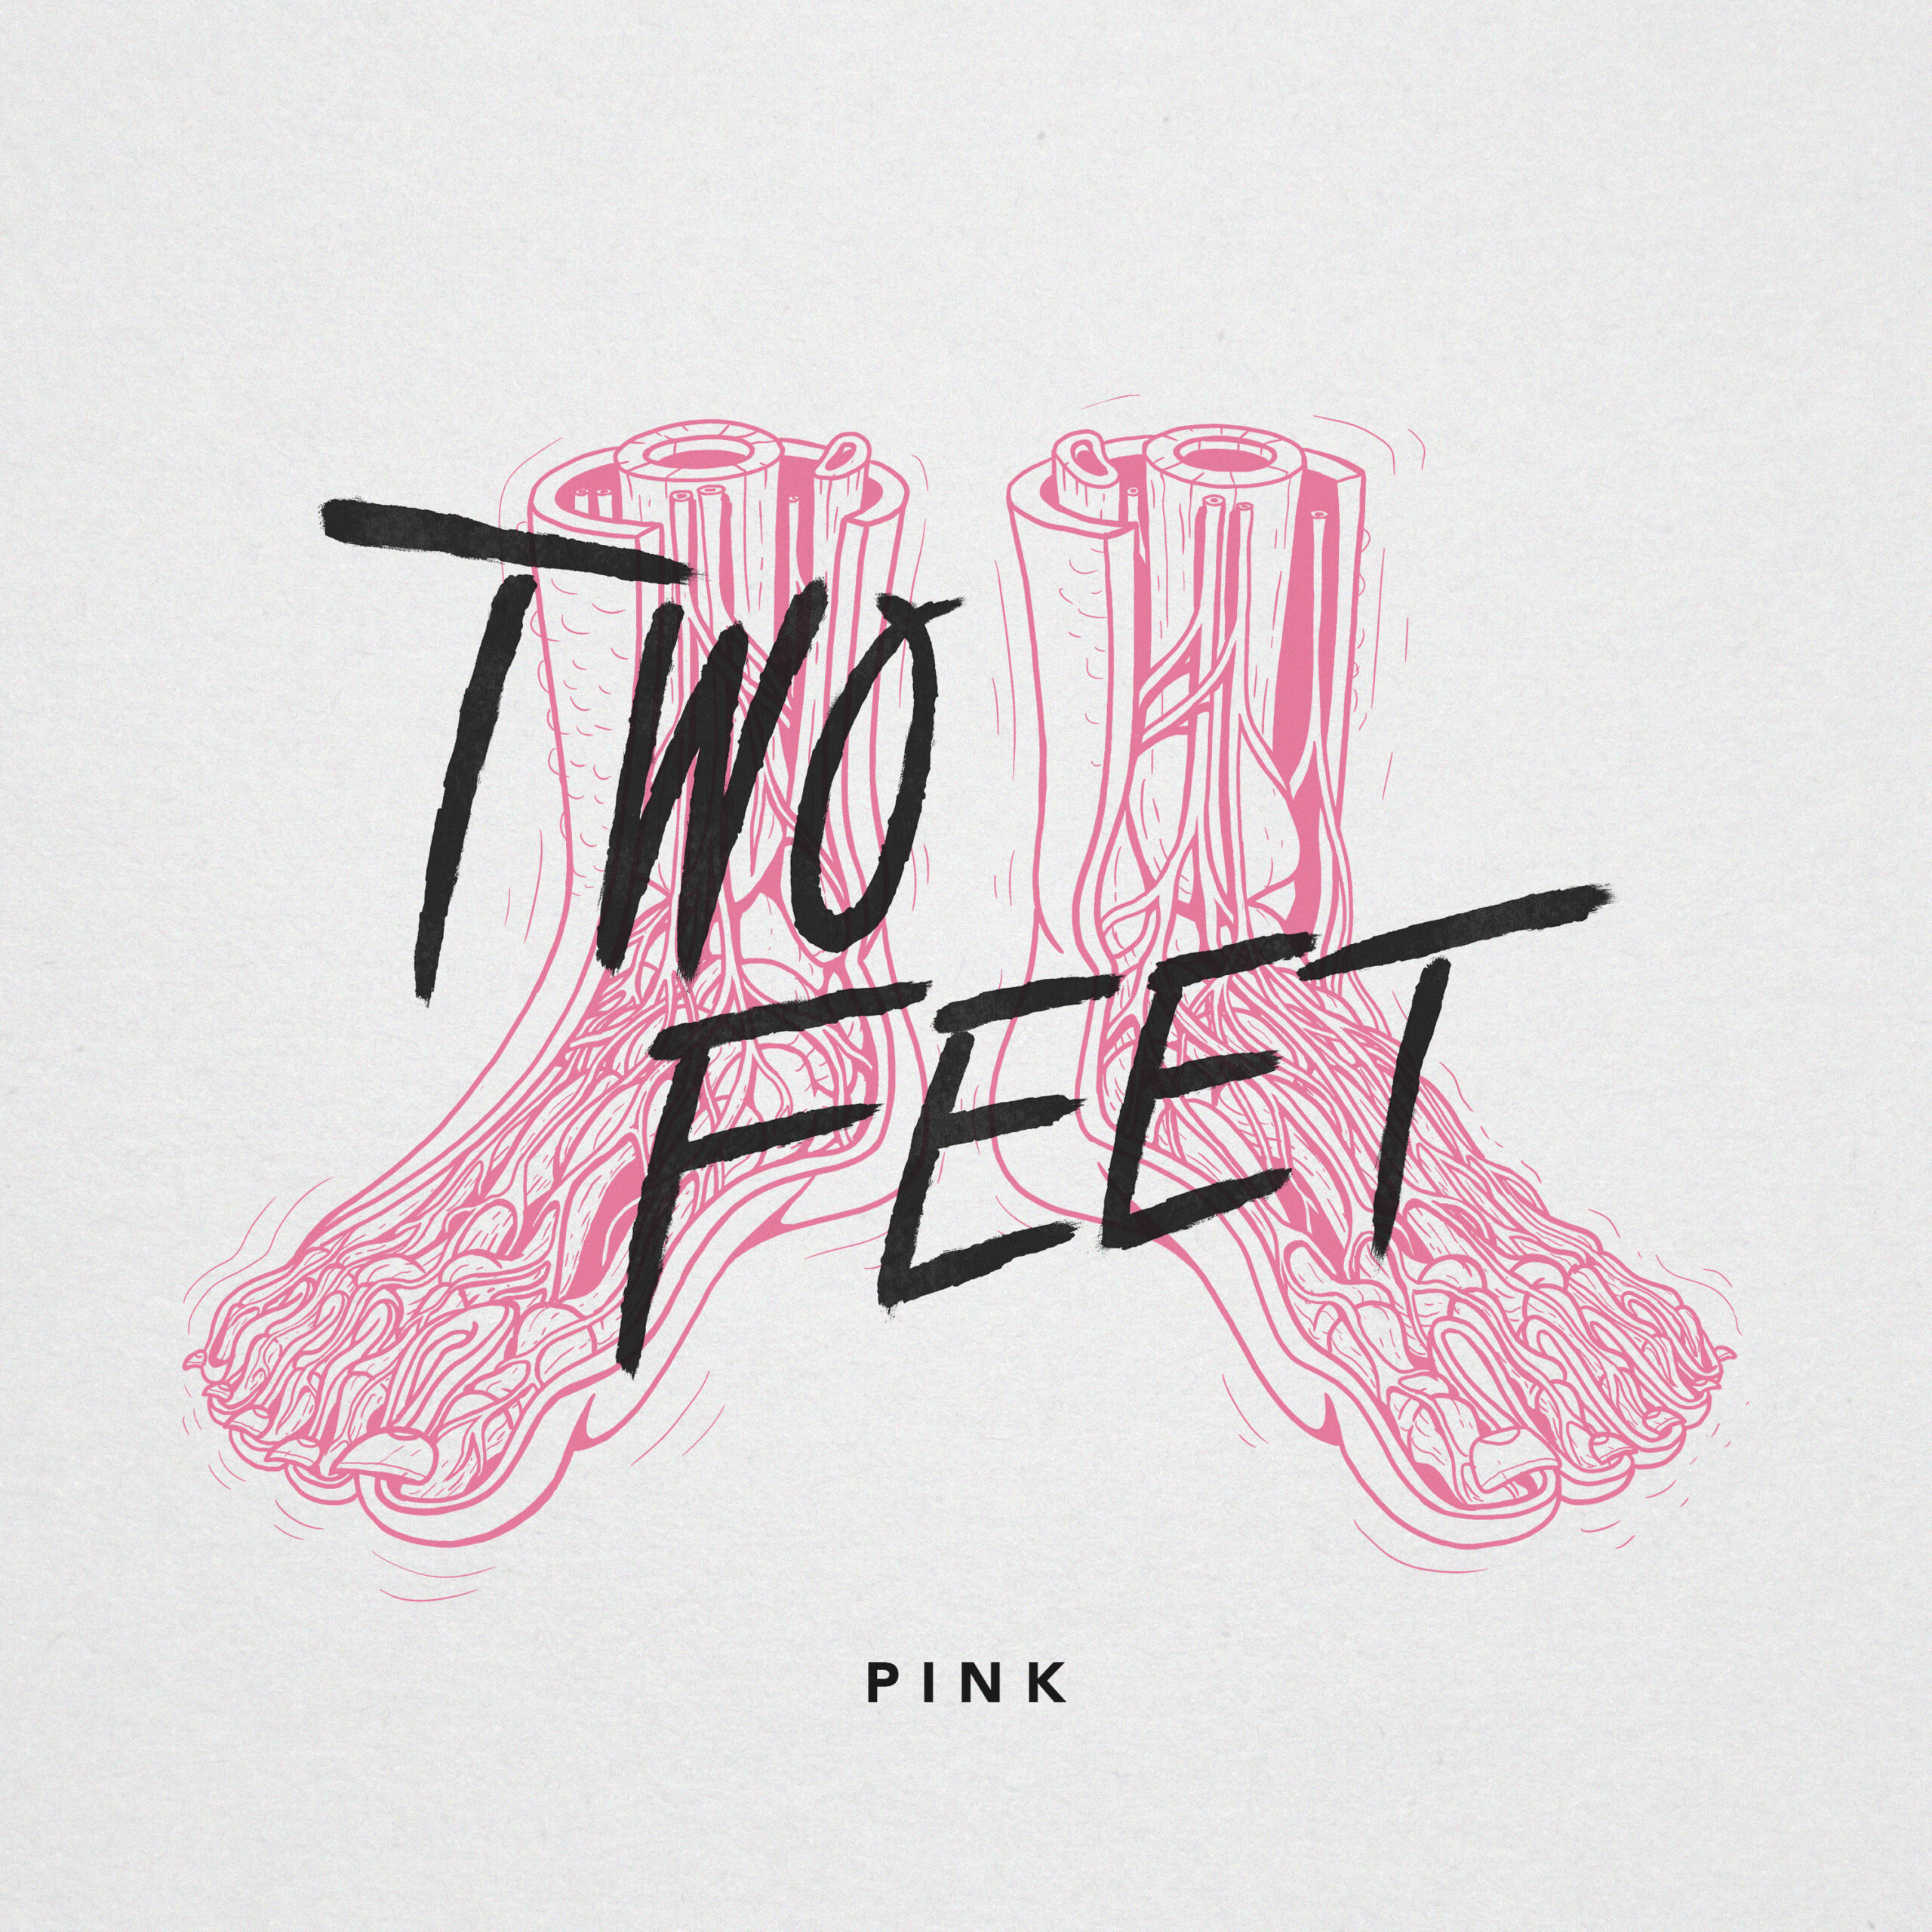 Two Feet, Pink, Album, Tour, Republic Records, Album release, new music, new single, Universal Music Group, Abigail Baldwin, Vaughn Lowery, 360 Magazine